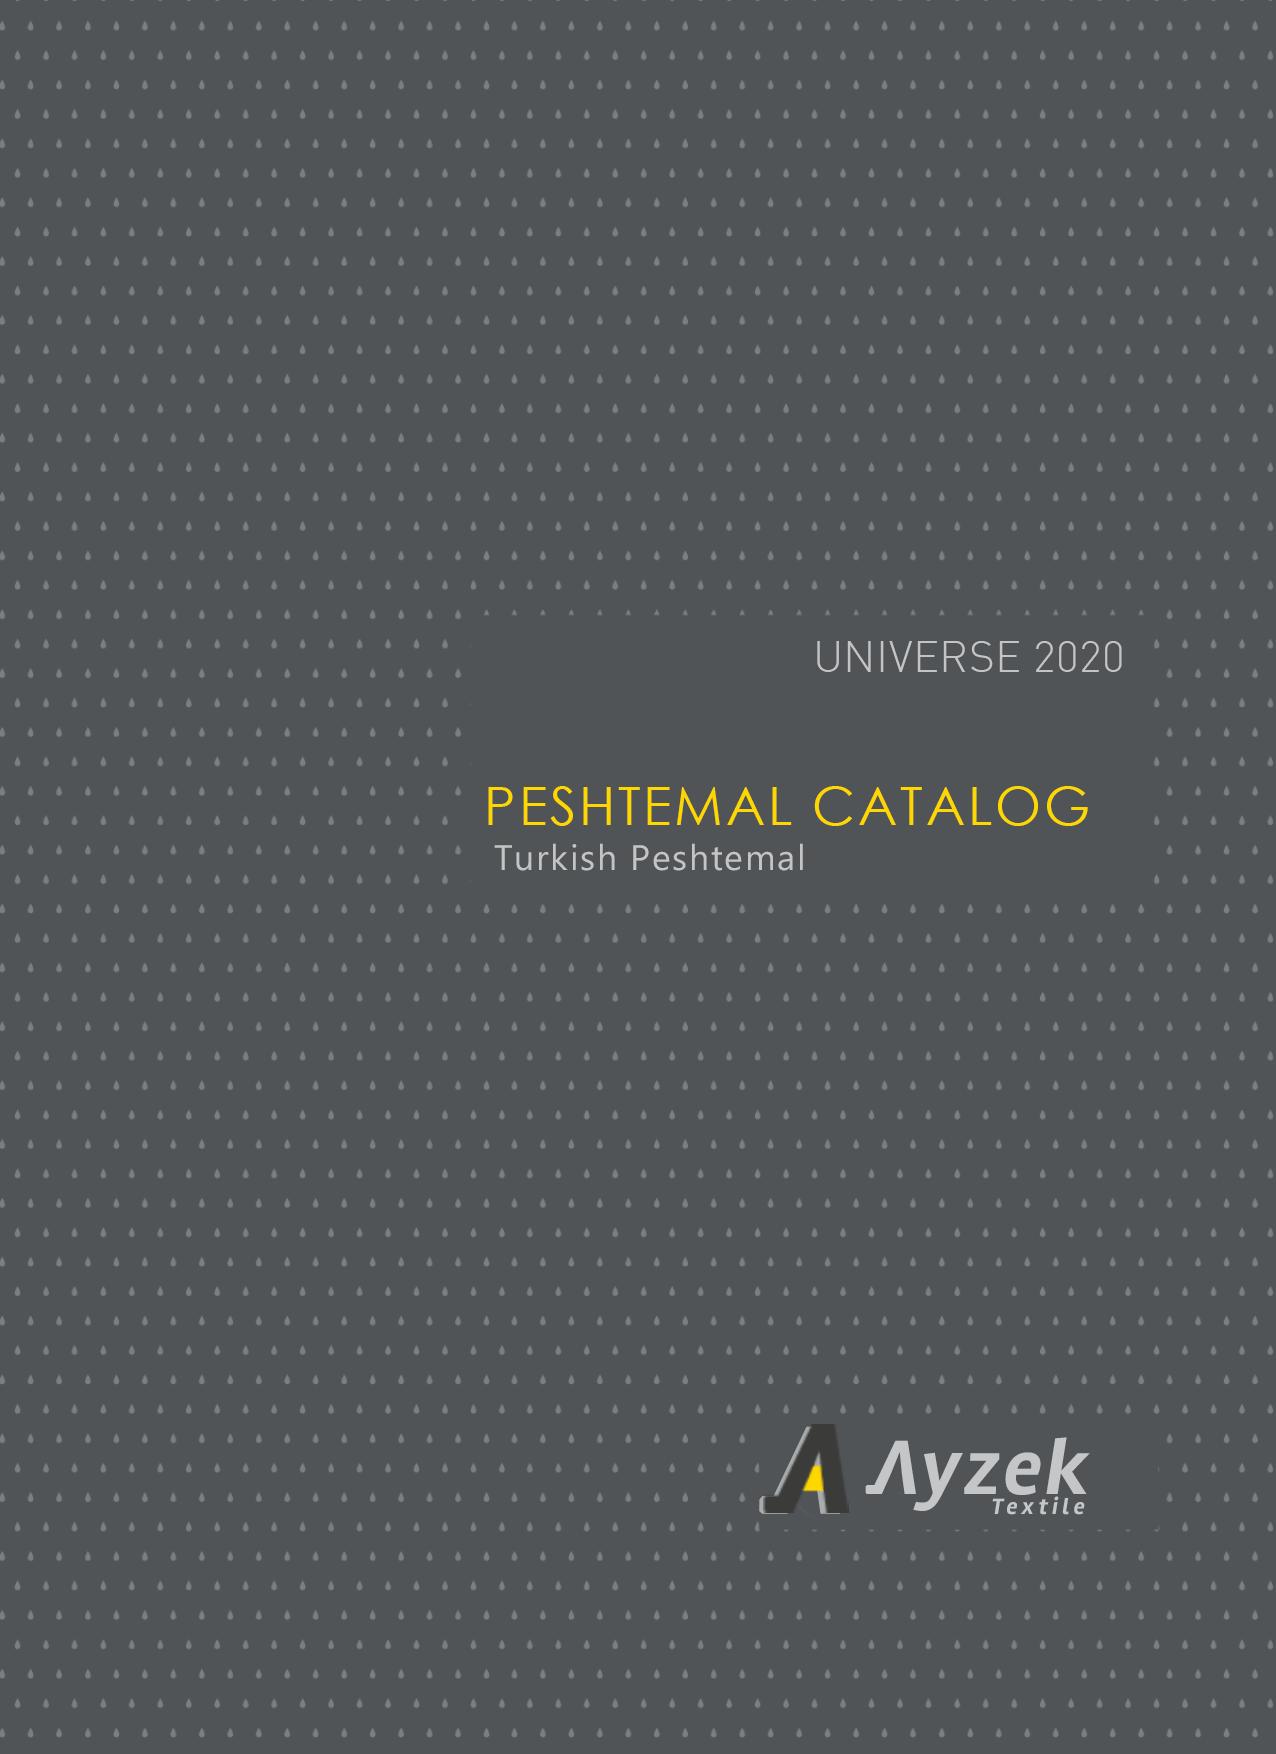 Ayzek Textile Peshtemal Catalog